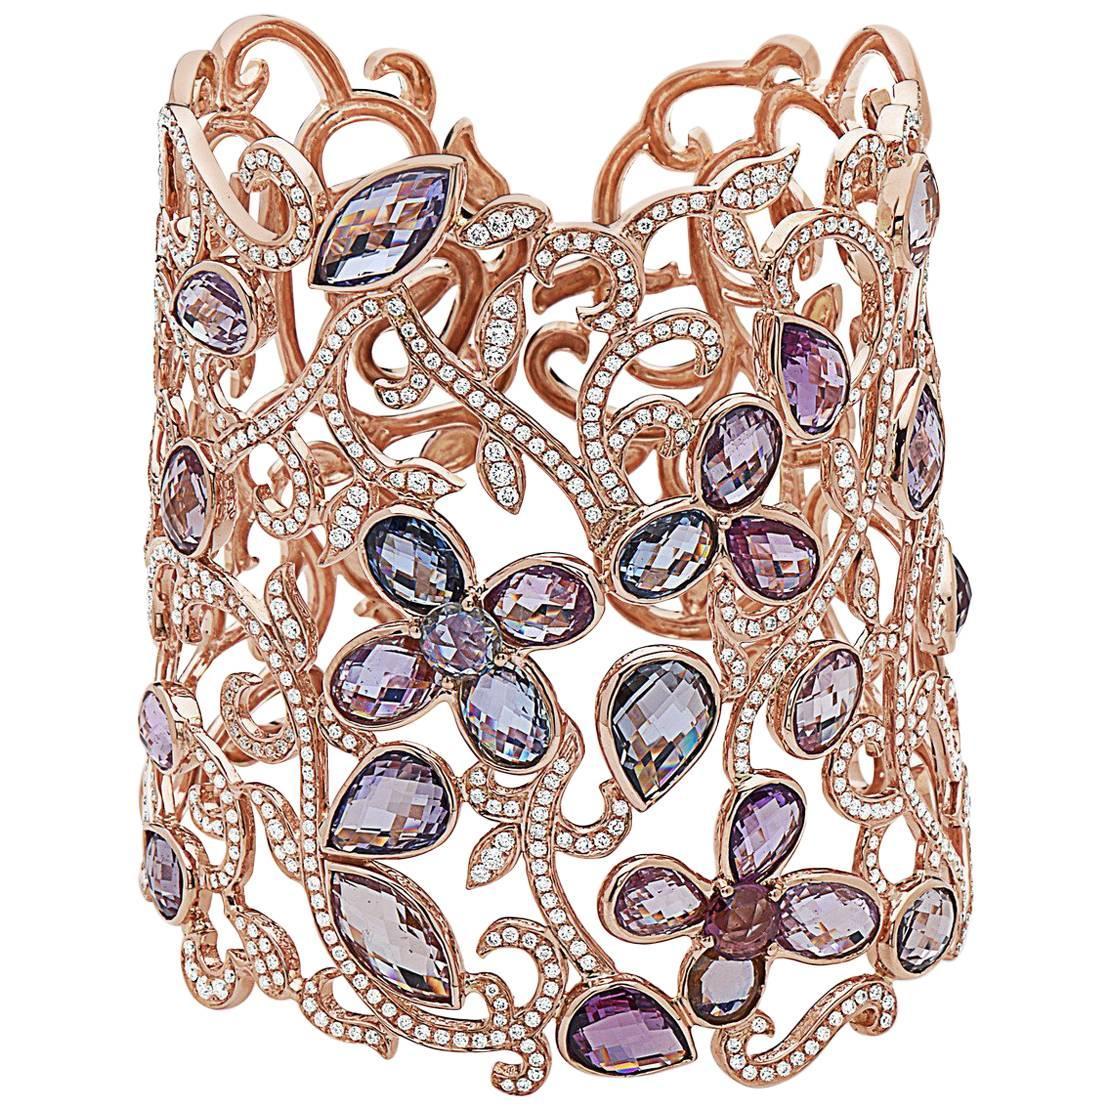 Emilio Jewelry 48.51 Carat Unique Fancy Diamond Bangle